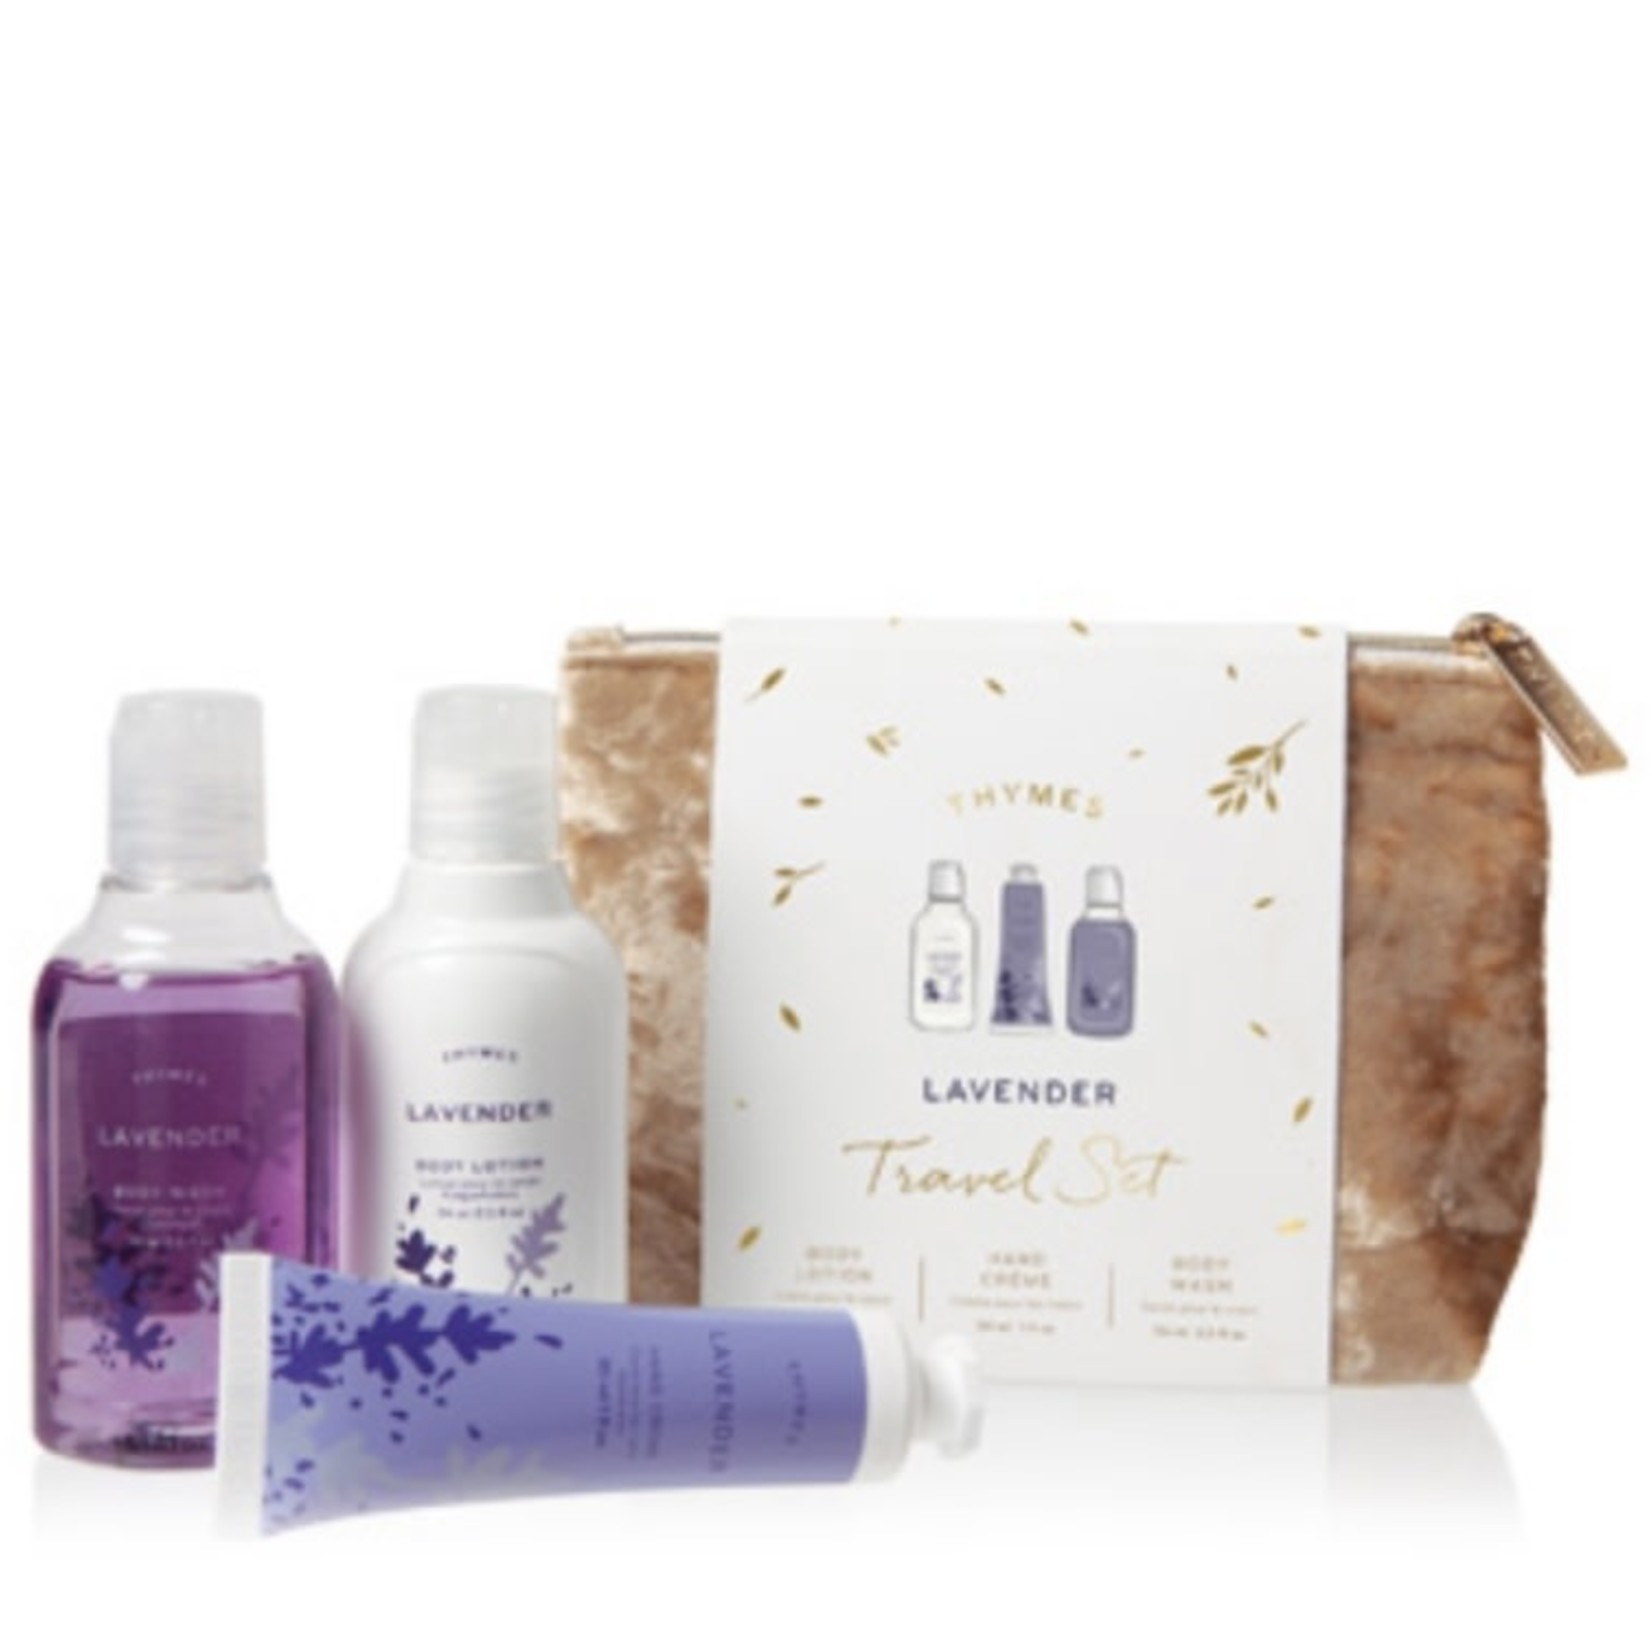 Thymes Lavender Travel Set